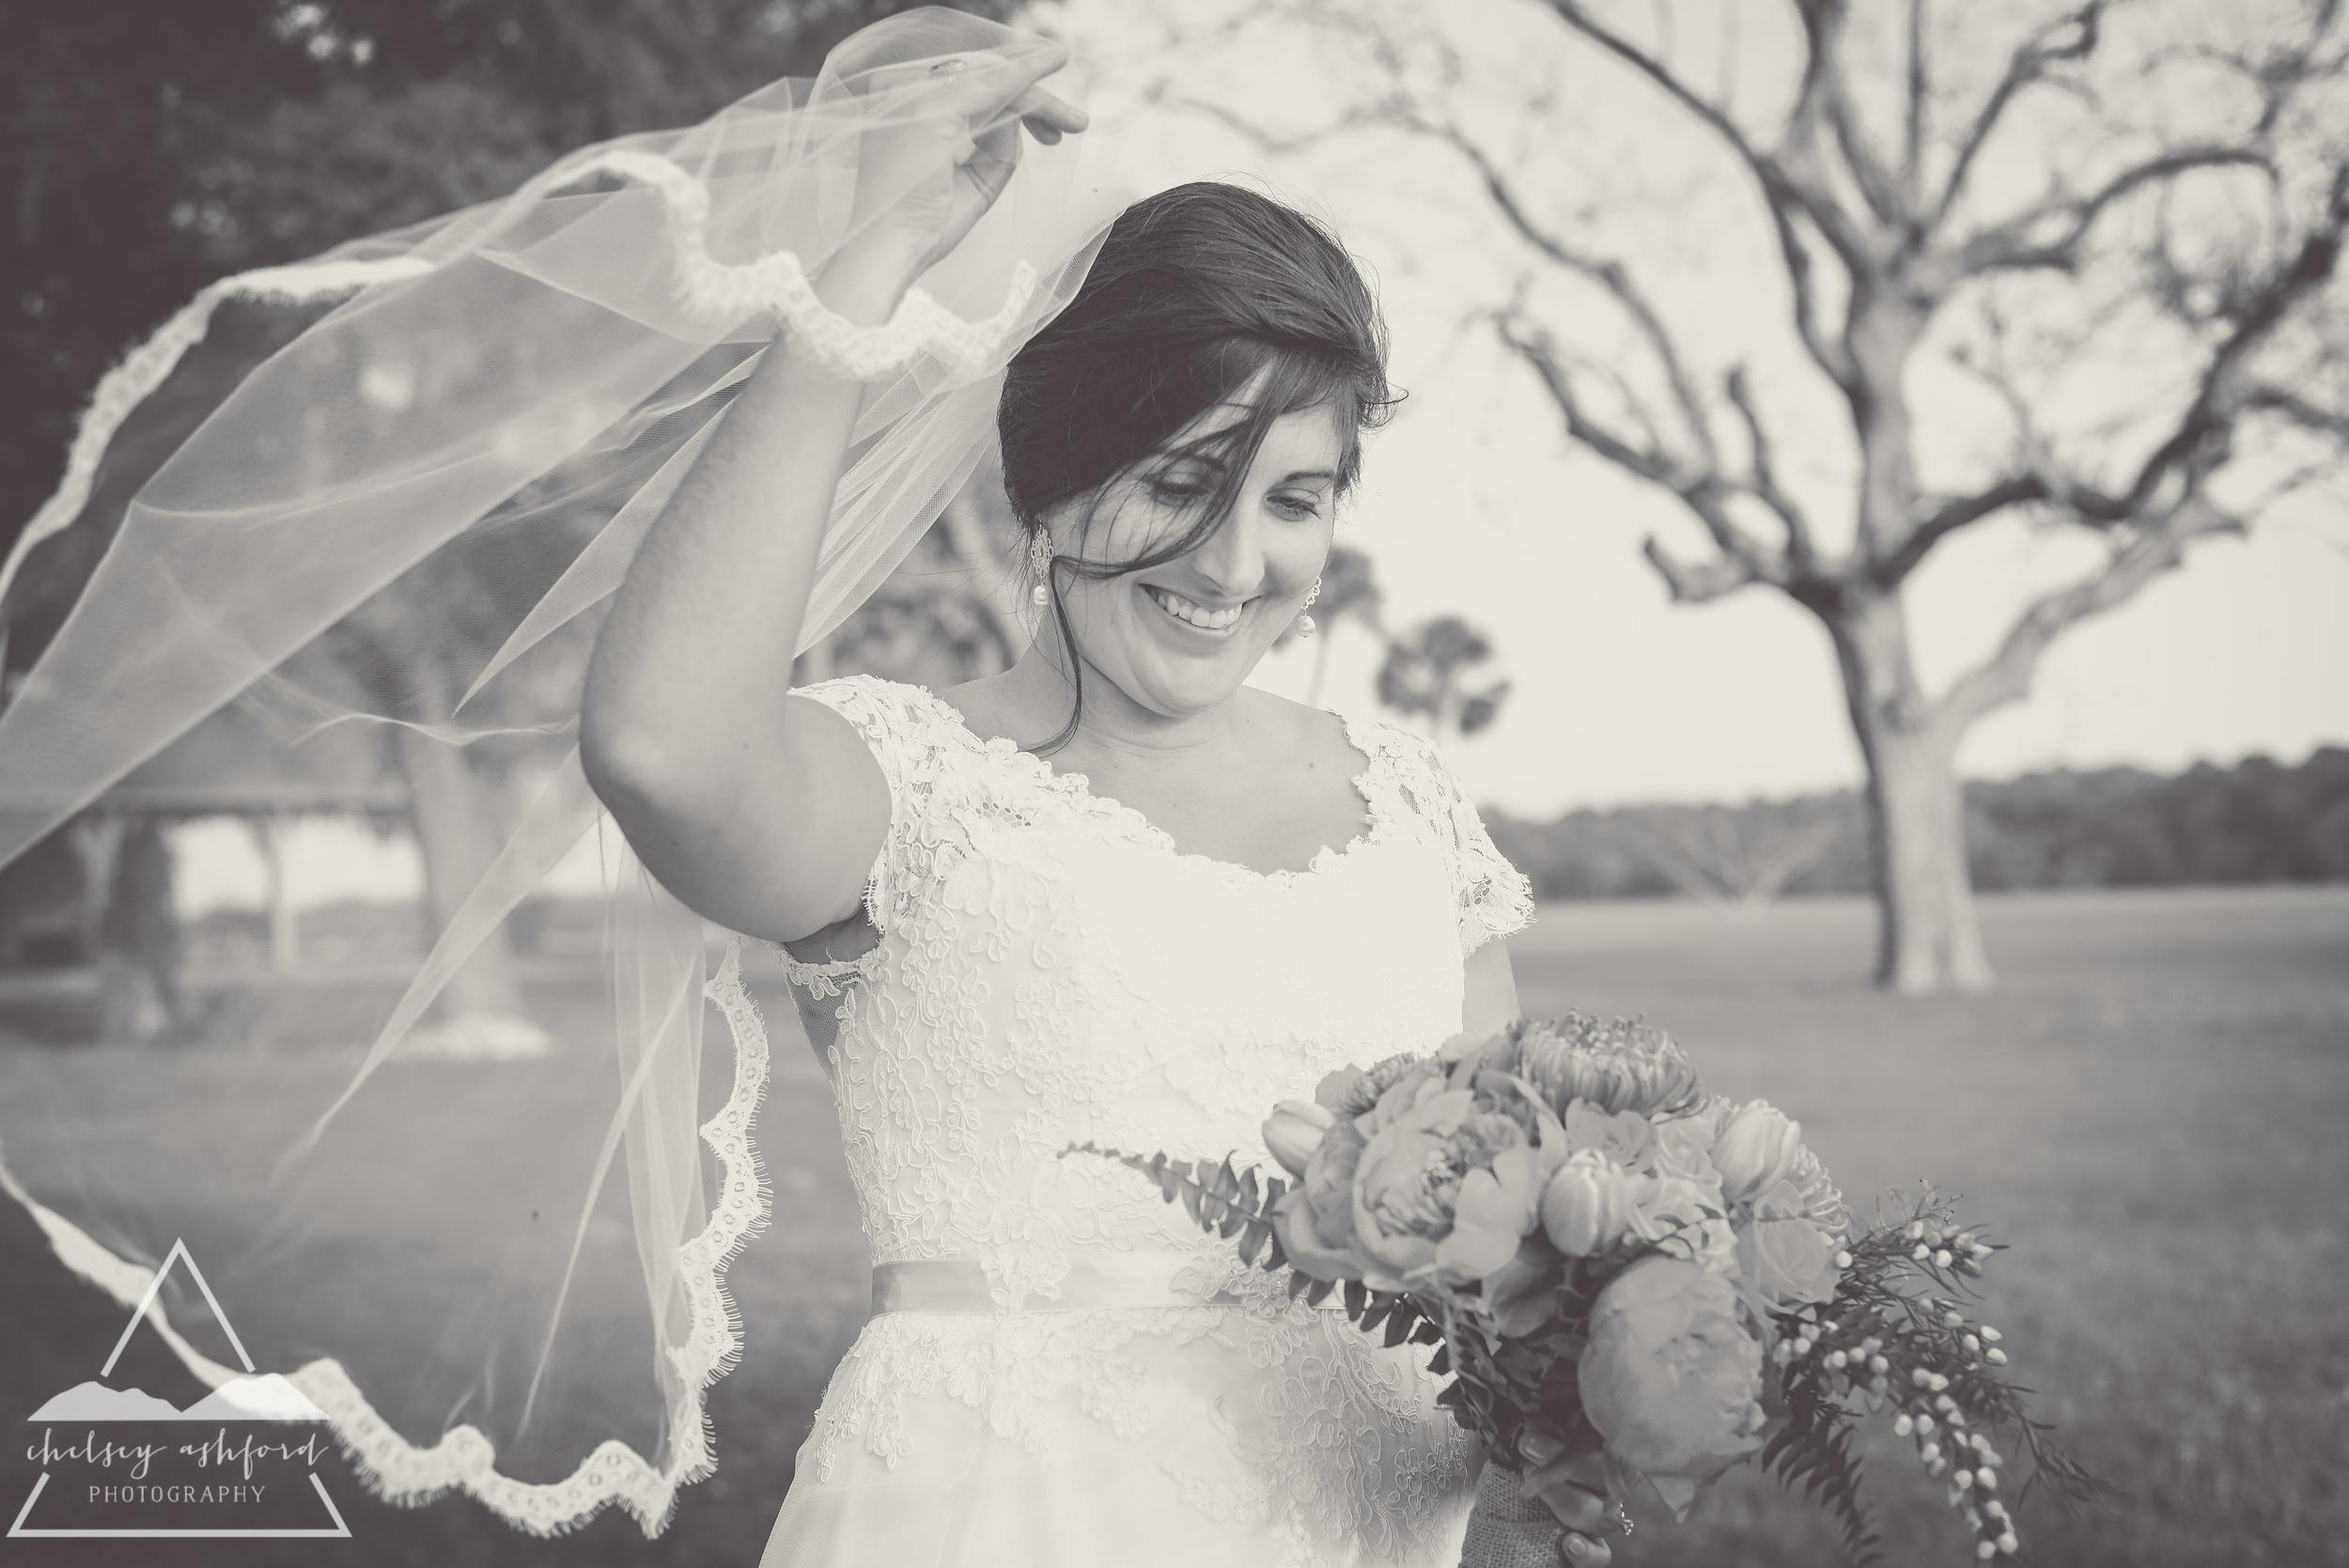 Sylvia_bridals_web-47.jpg